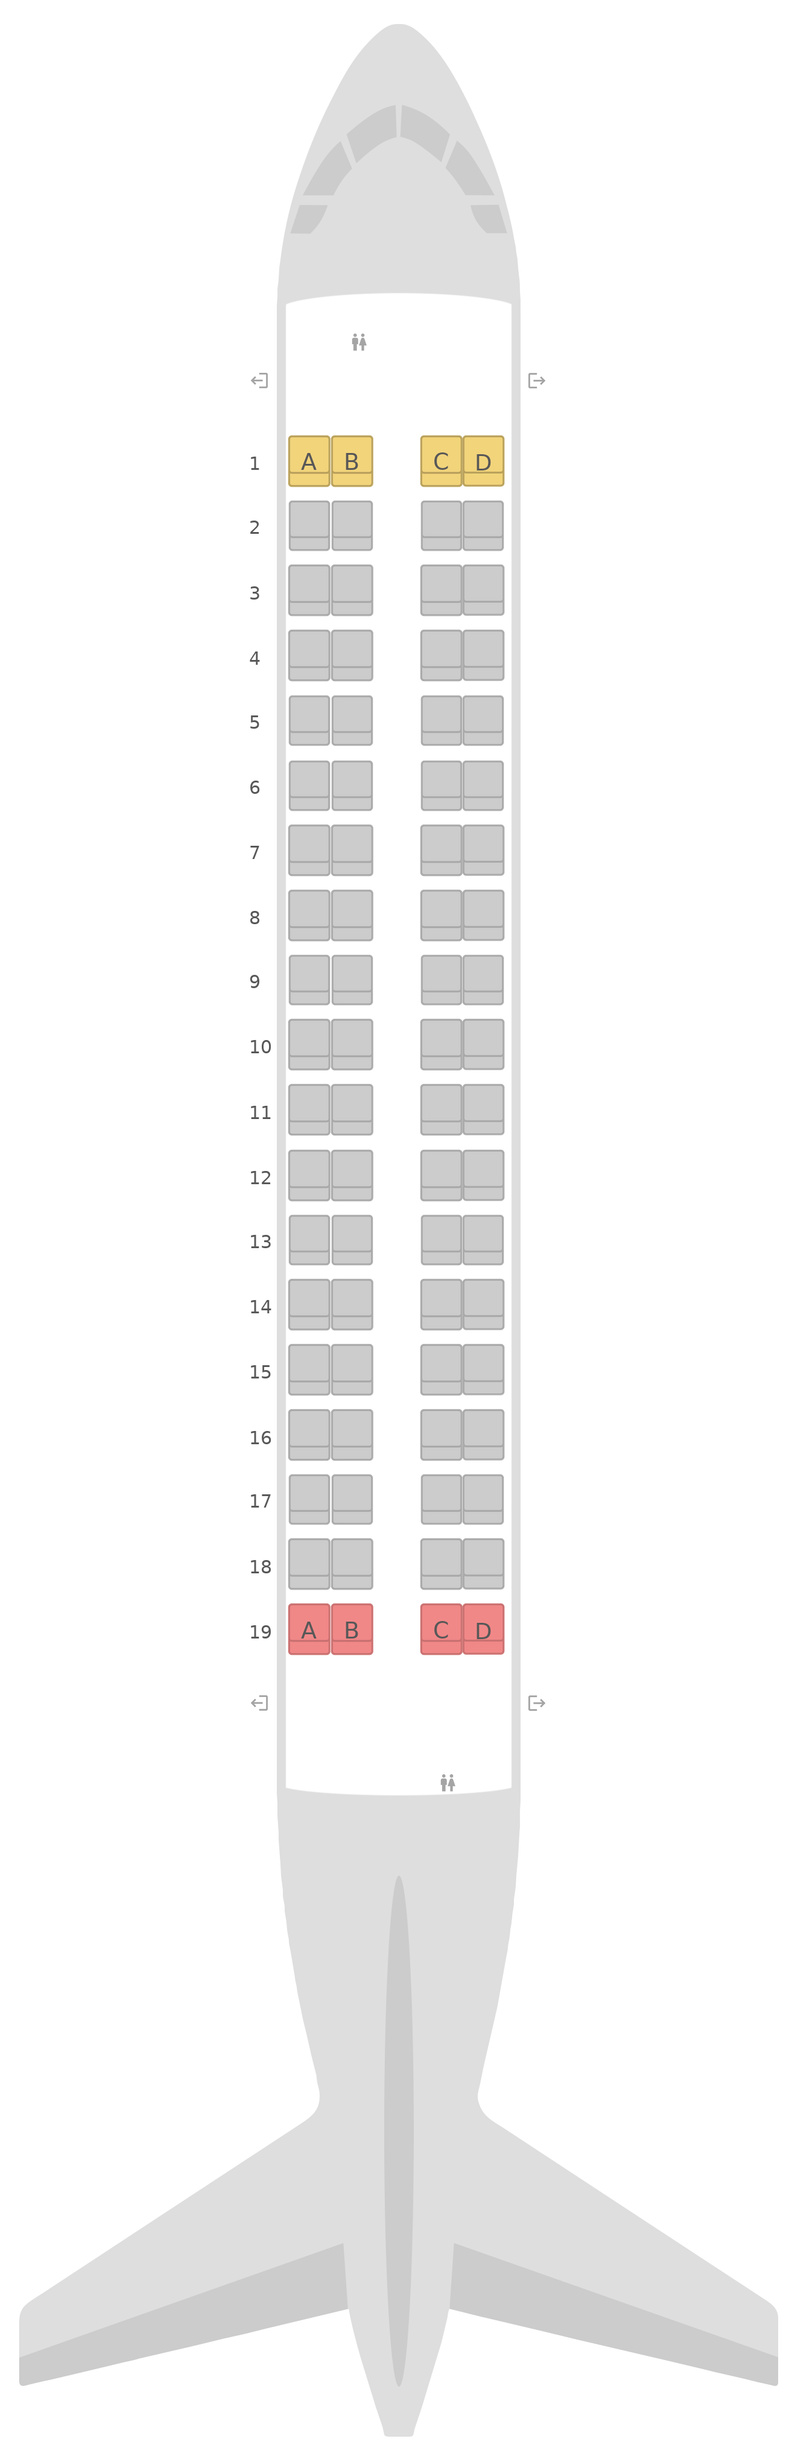 Mapa de asientos Embraer E170 British Airways